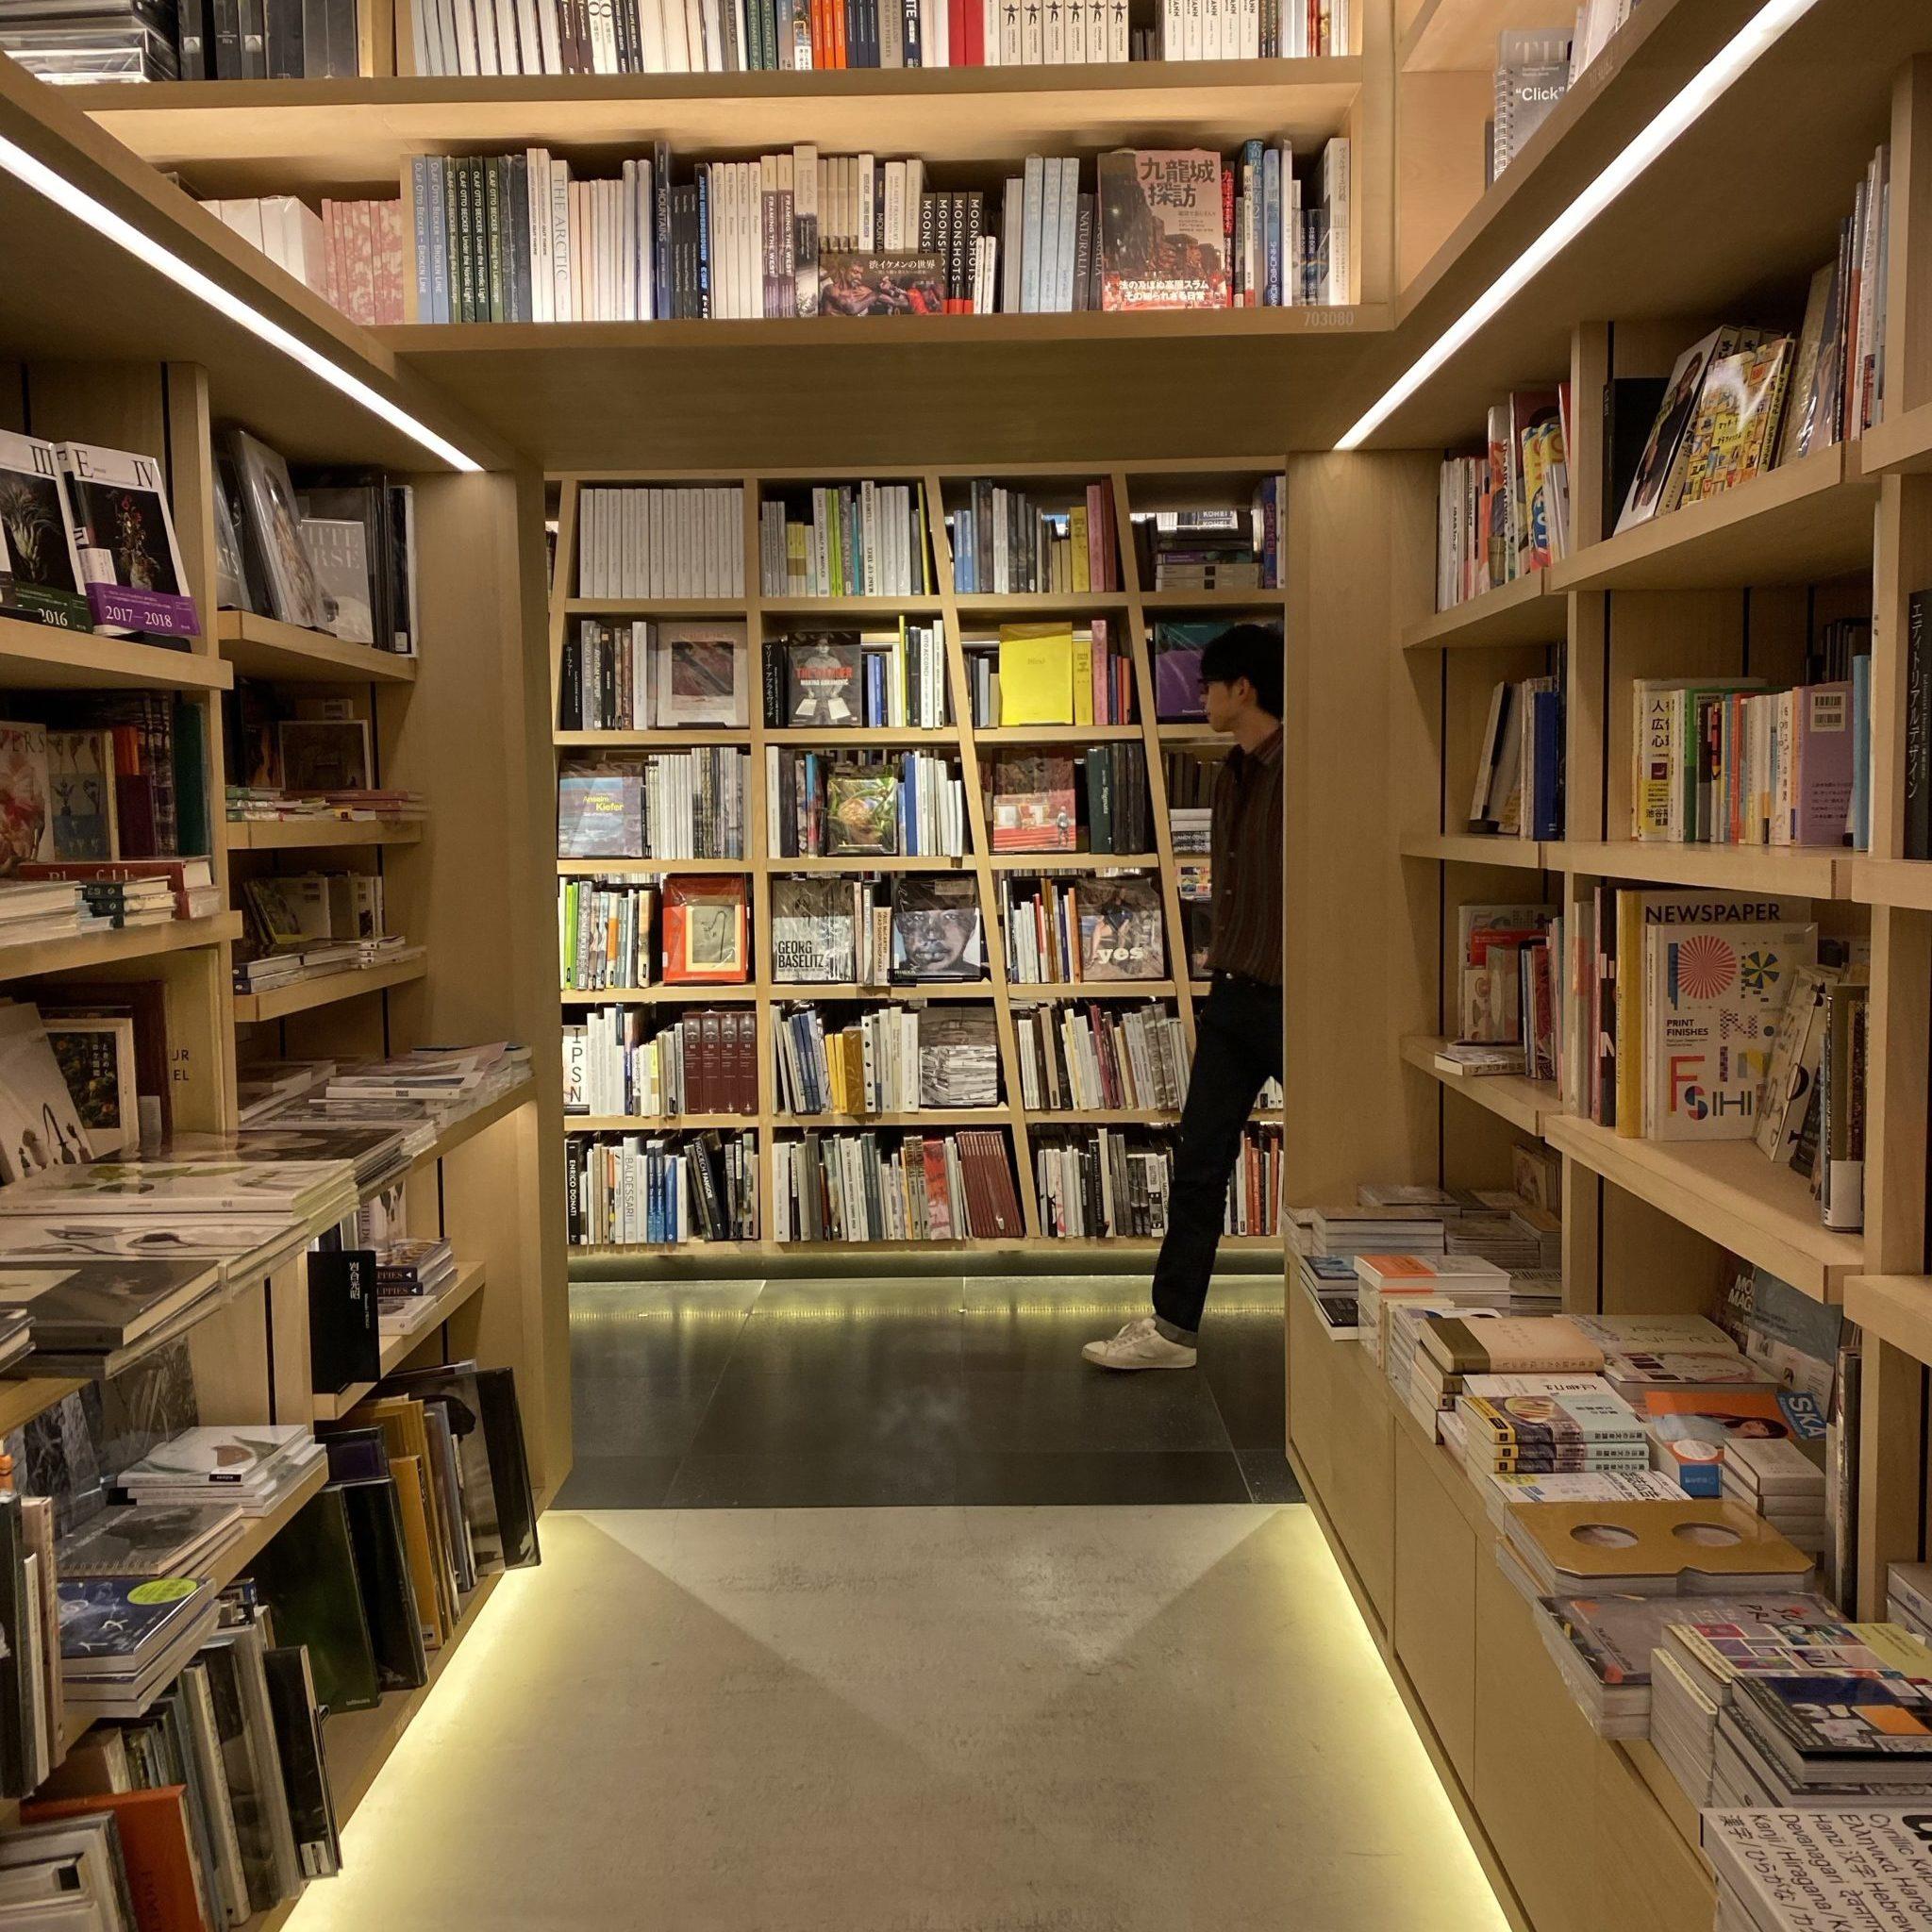 labary bibliotheek design placing books Tokio tokyo Japan grid closet research